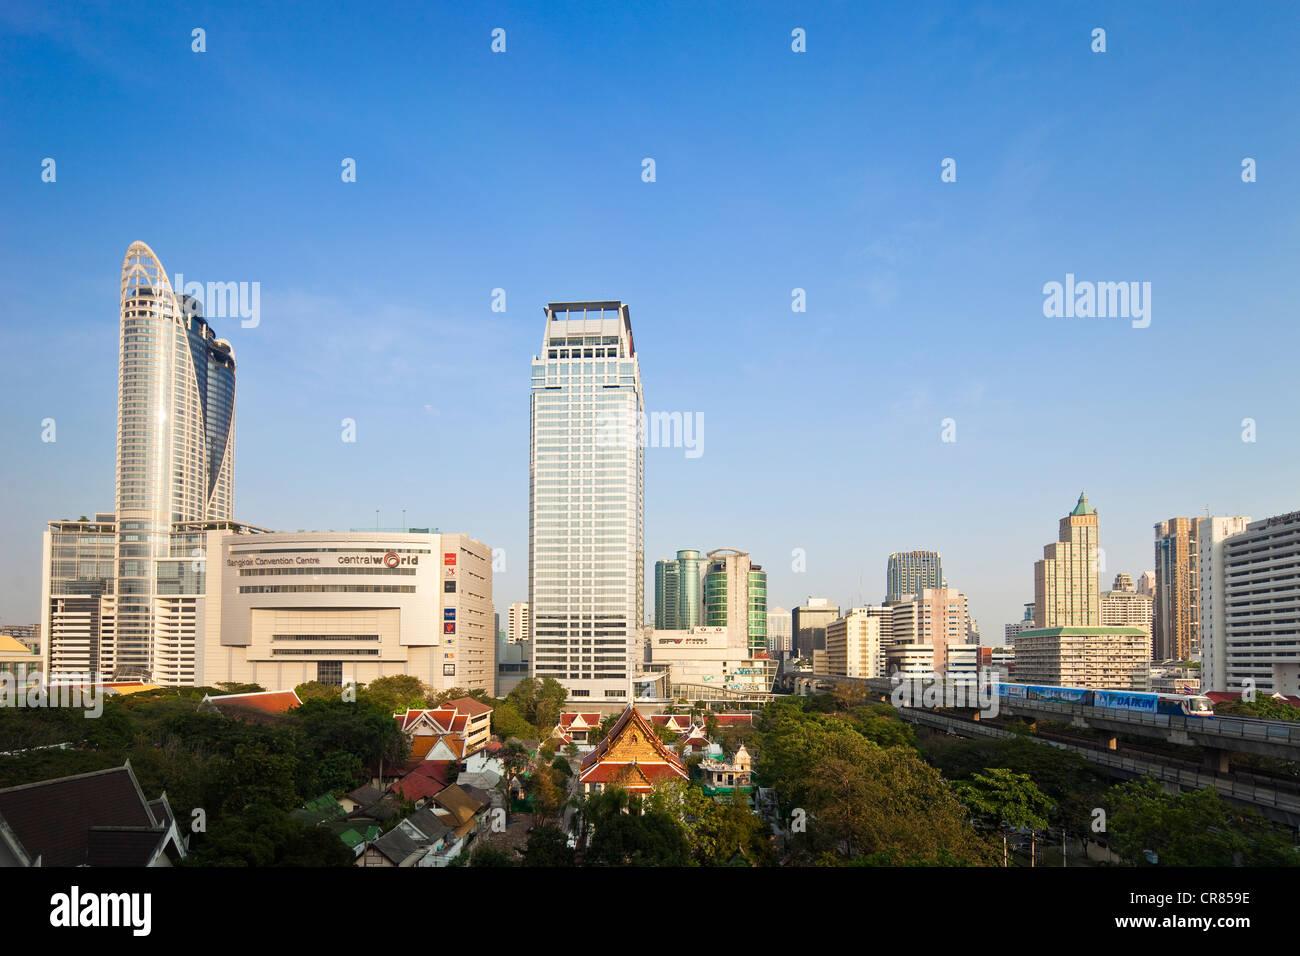 Thailand, Bangkok, Siam square district Stock Photo